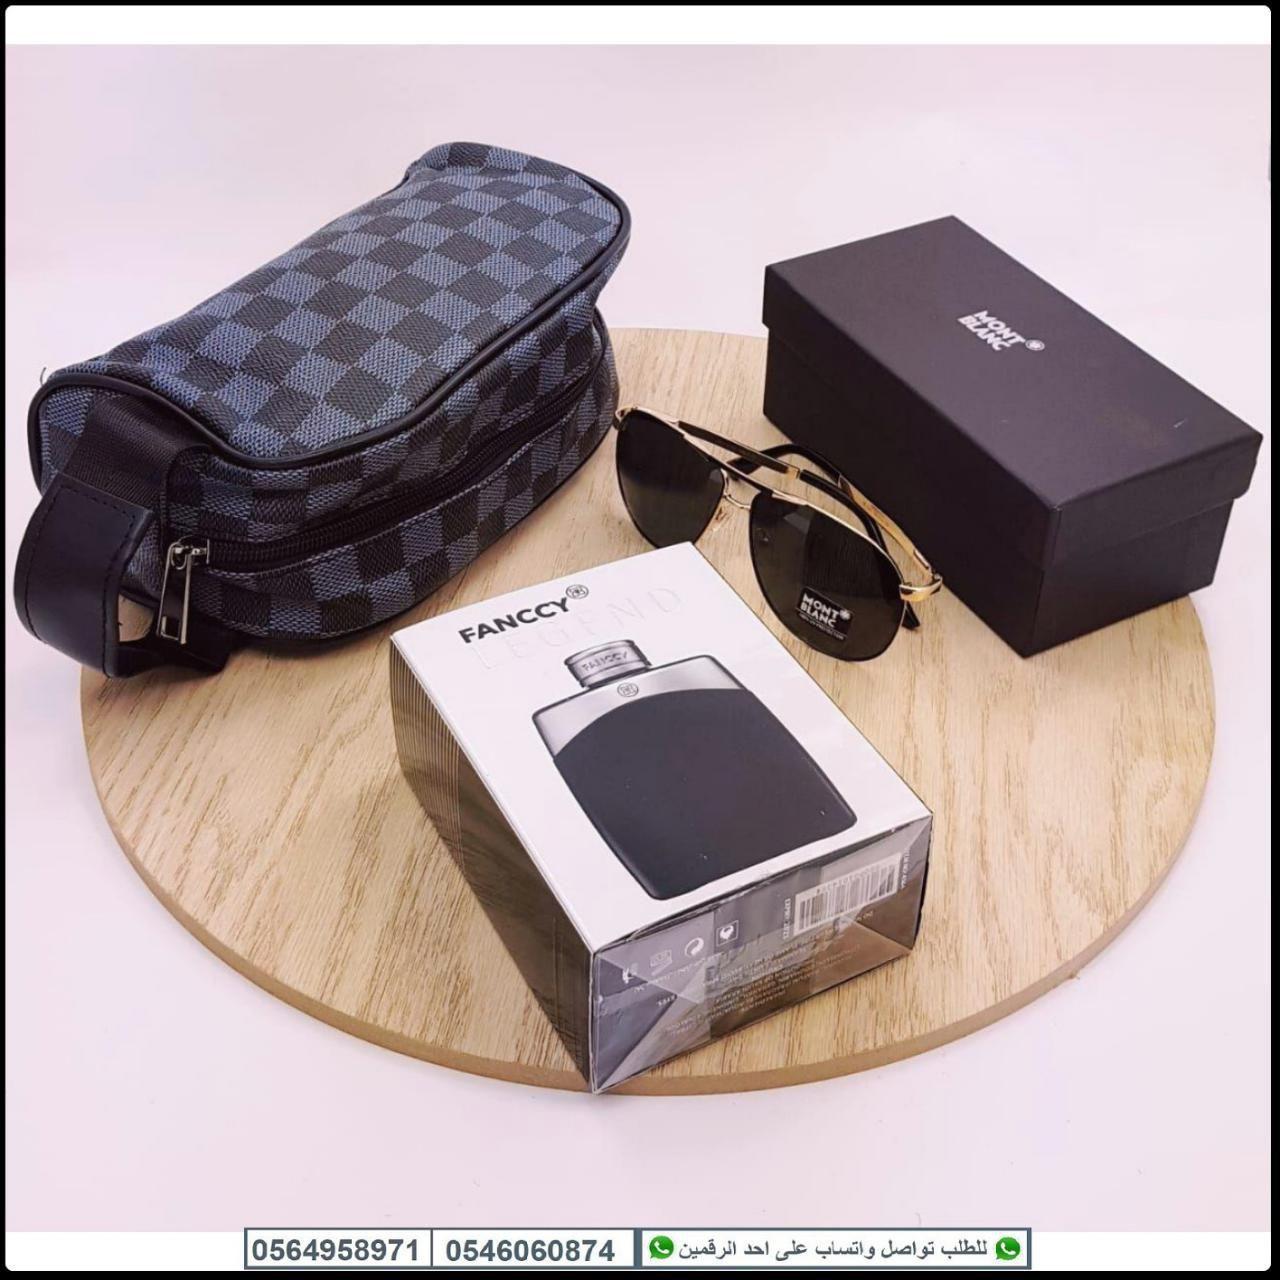 نظارات شمسية 2019 عرض جديد نظارة مونت بلانك مع عطر و شنطة يد Camera Bag Electronic Products Bags